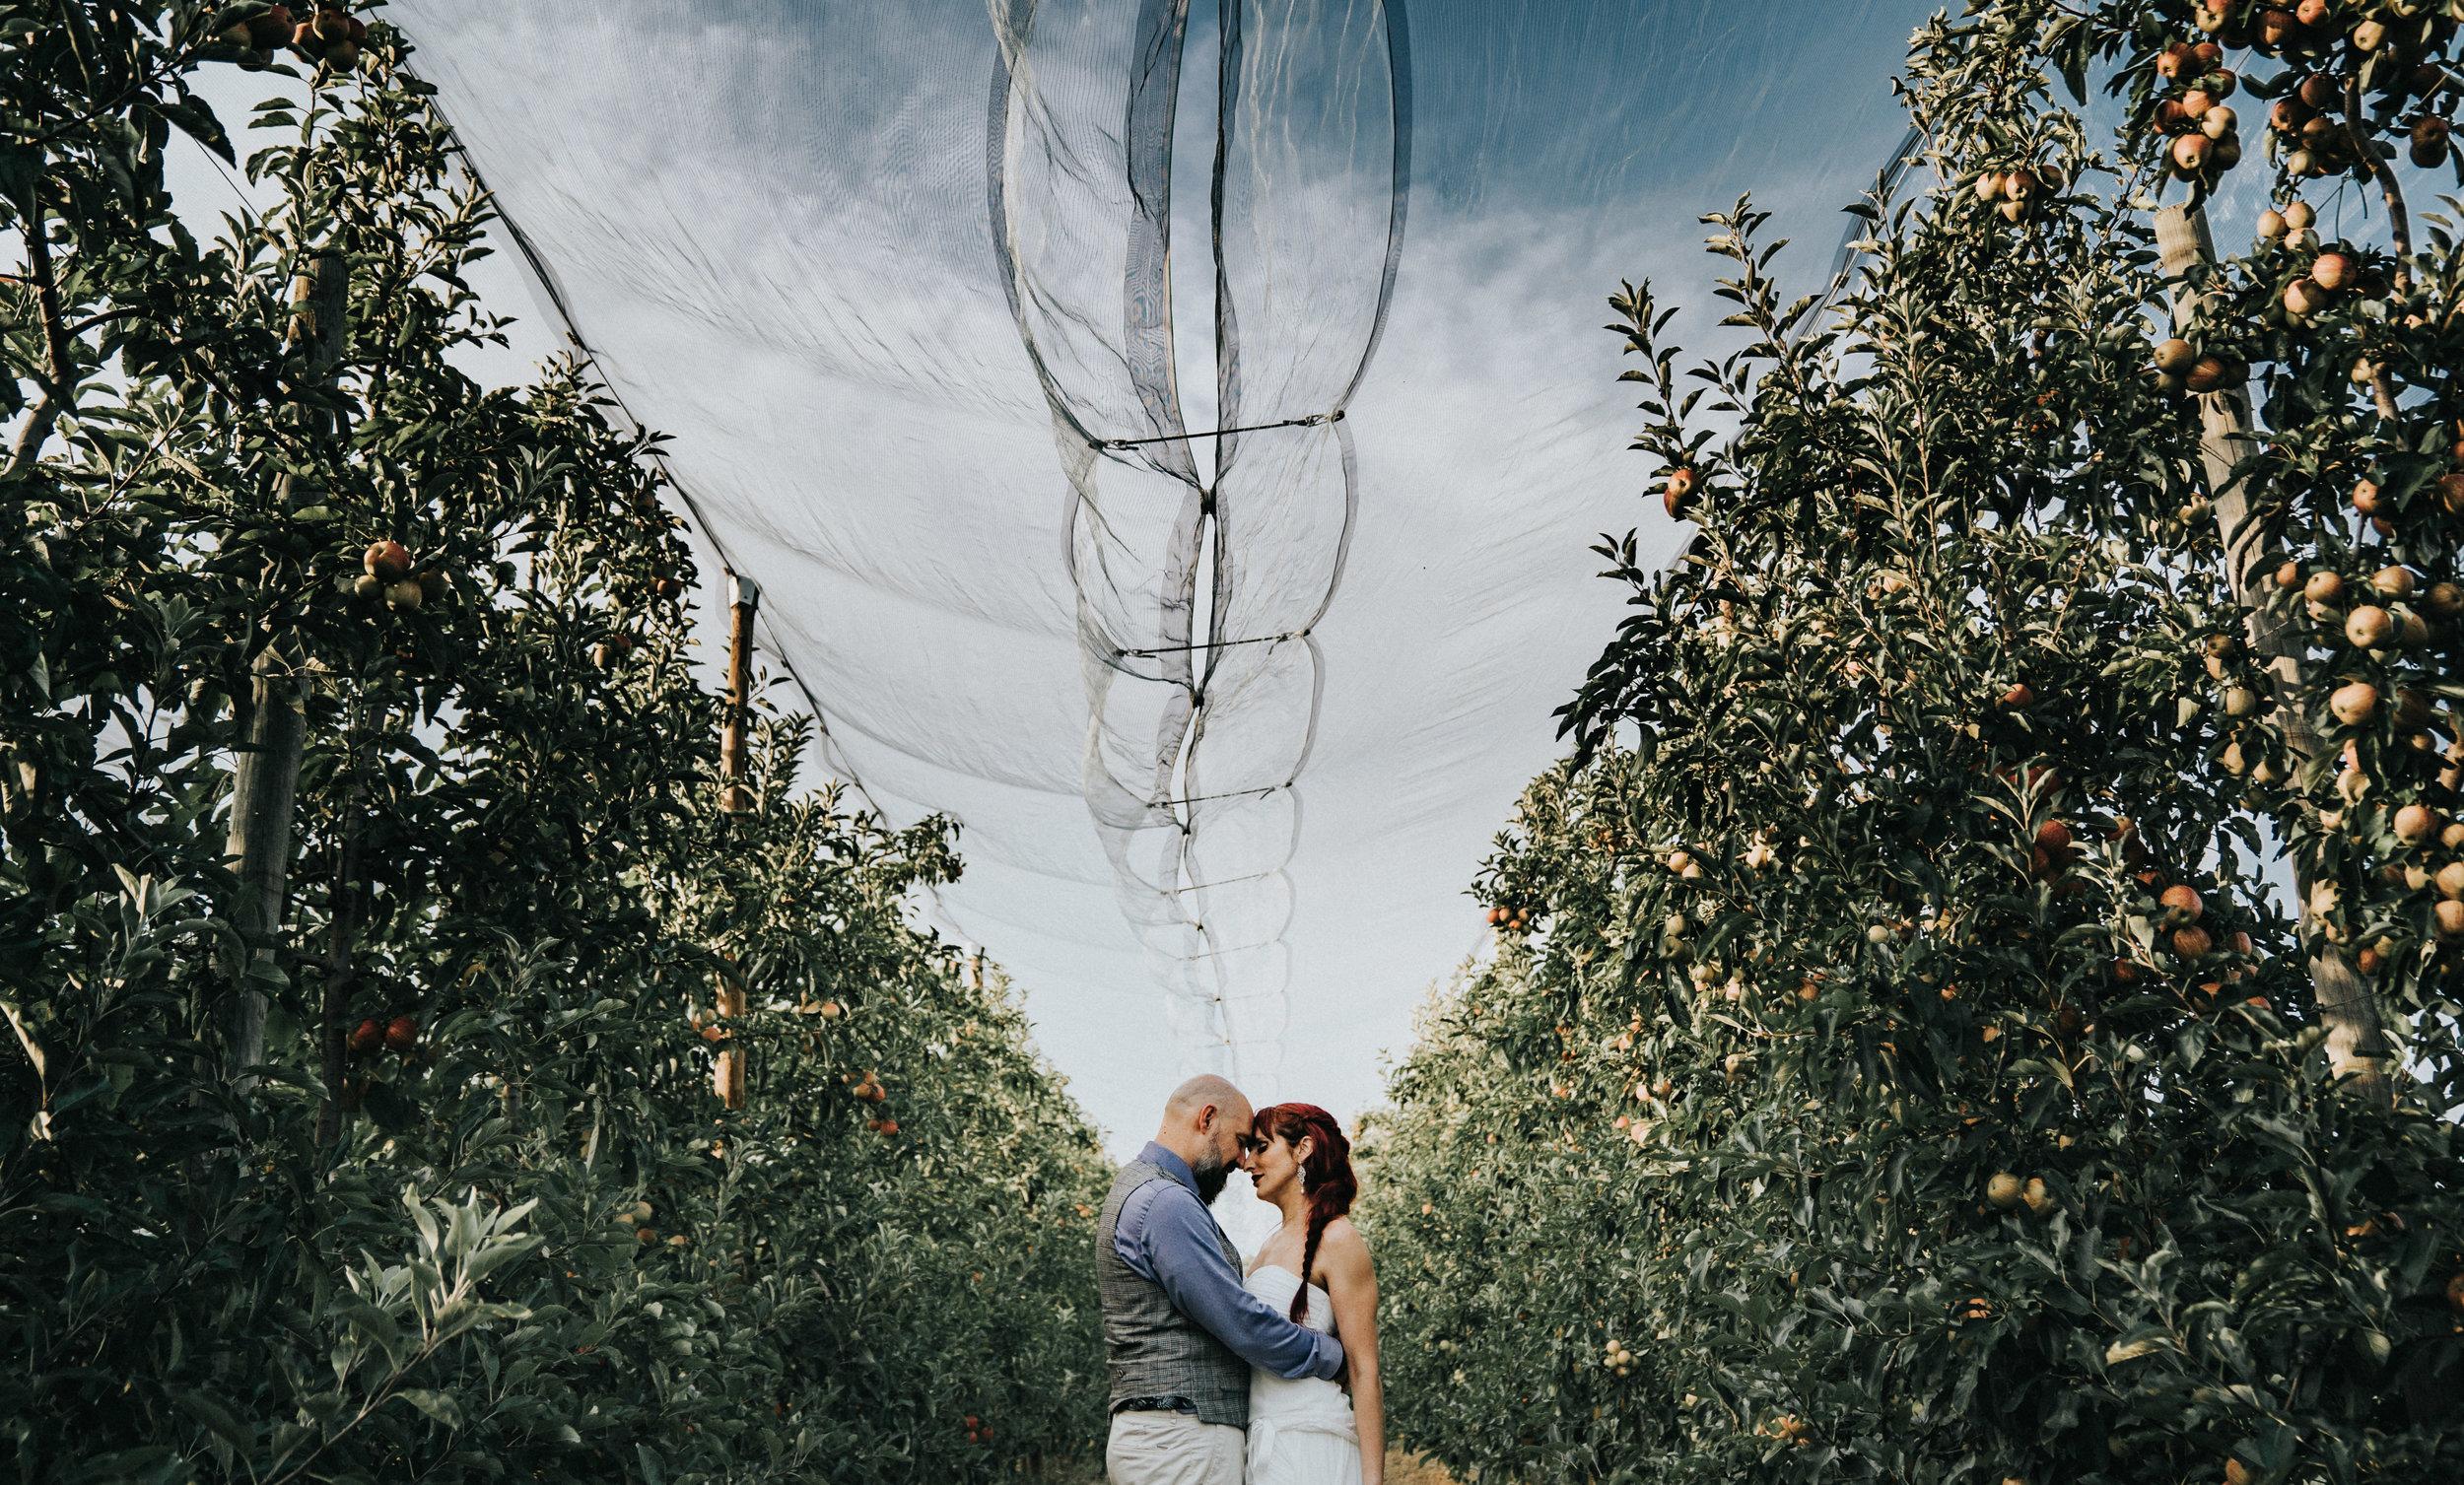 carcassonne-rural-french-wedding-photographer-france-110